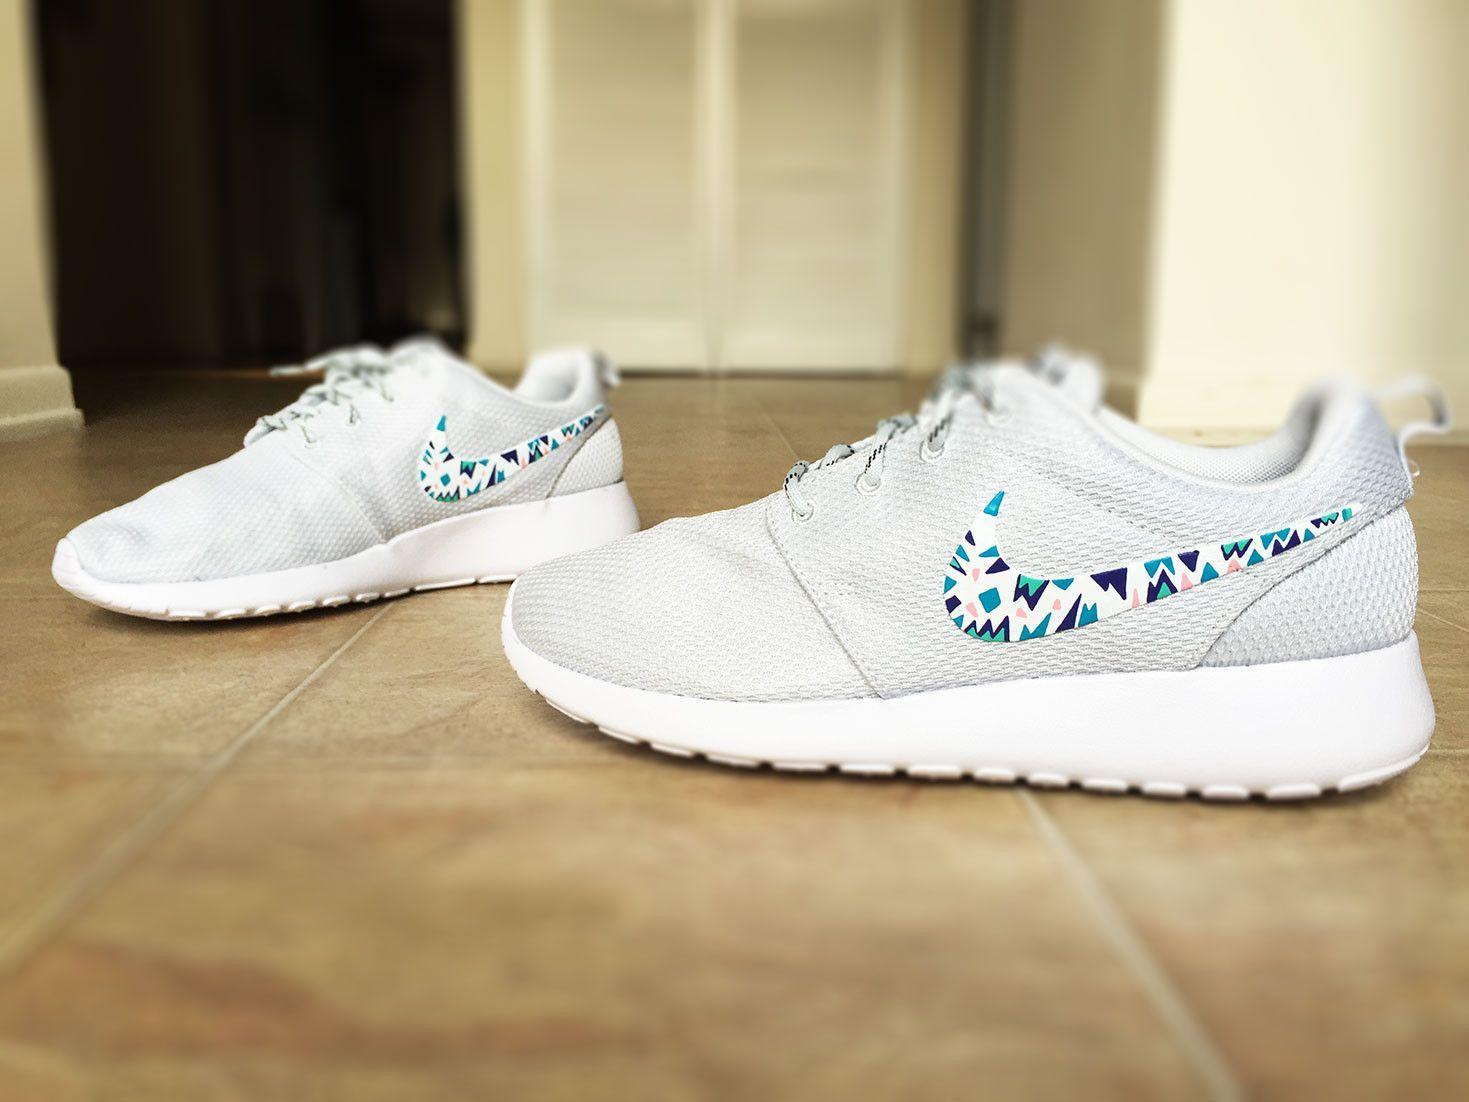 online store 0e1a2 6a55e Womens Custom Nike Roshe Run sneakers, triangles, purple, pink, teal, blue  trendy design, platinum white metallic nike roshe